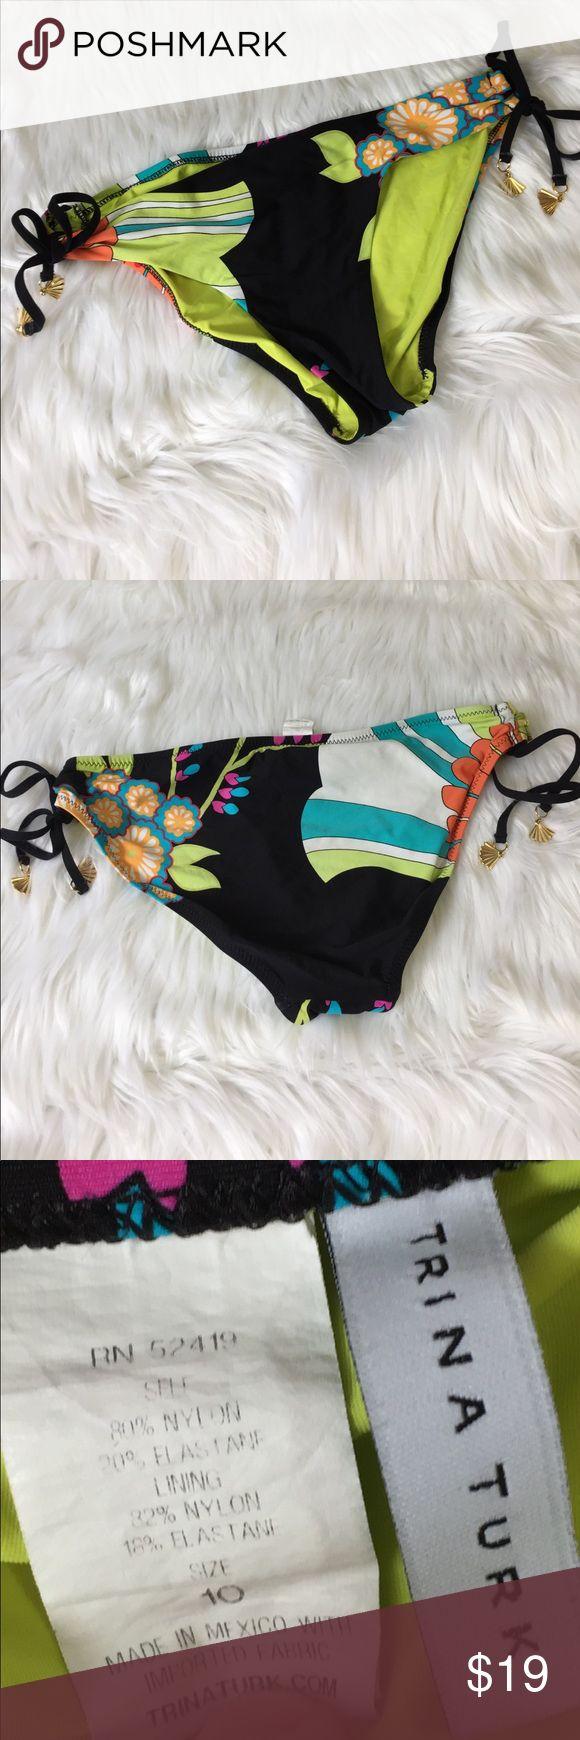 Trina Turk bikini bottoms gold seashell tie sz 10 Vibrant bikini bottoms from Trina Turk.  Side ties with gold seashell embellishment.  Size 10. Trina Turk Swim Bikinis